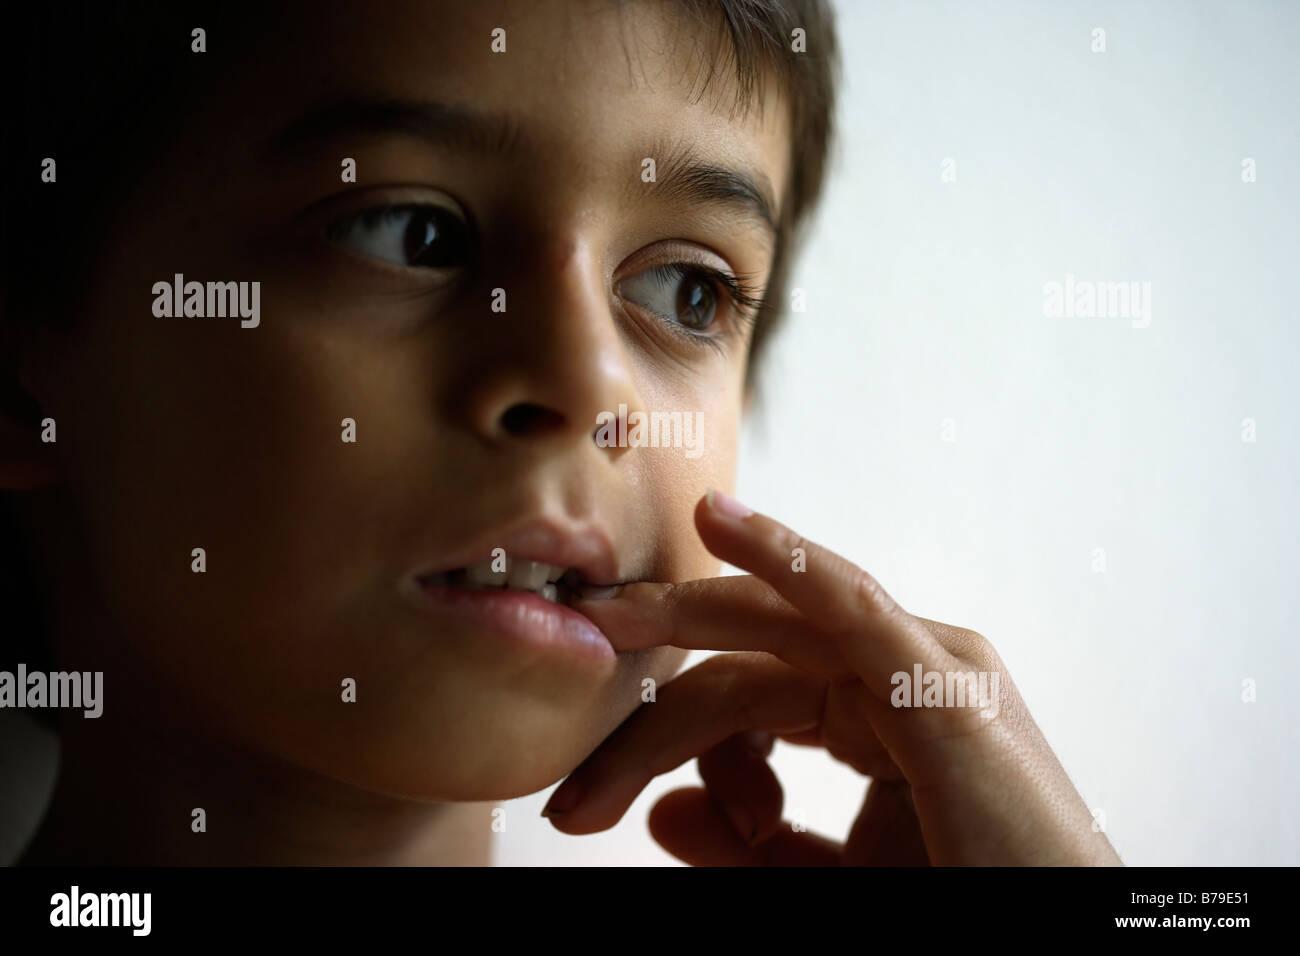 Sechs Jahre alter Junge kaut Nägel Stockbild